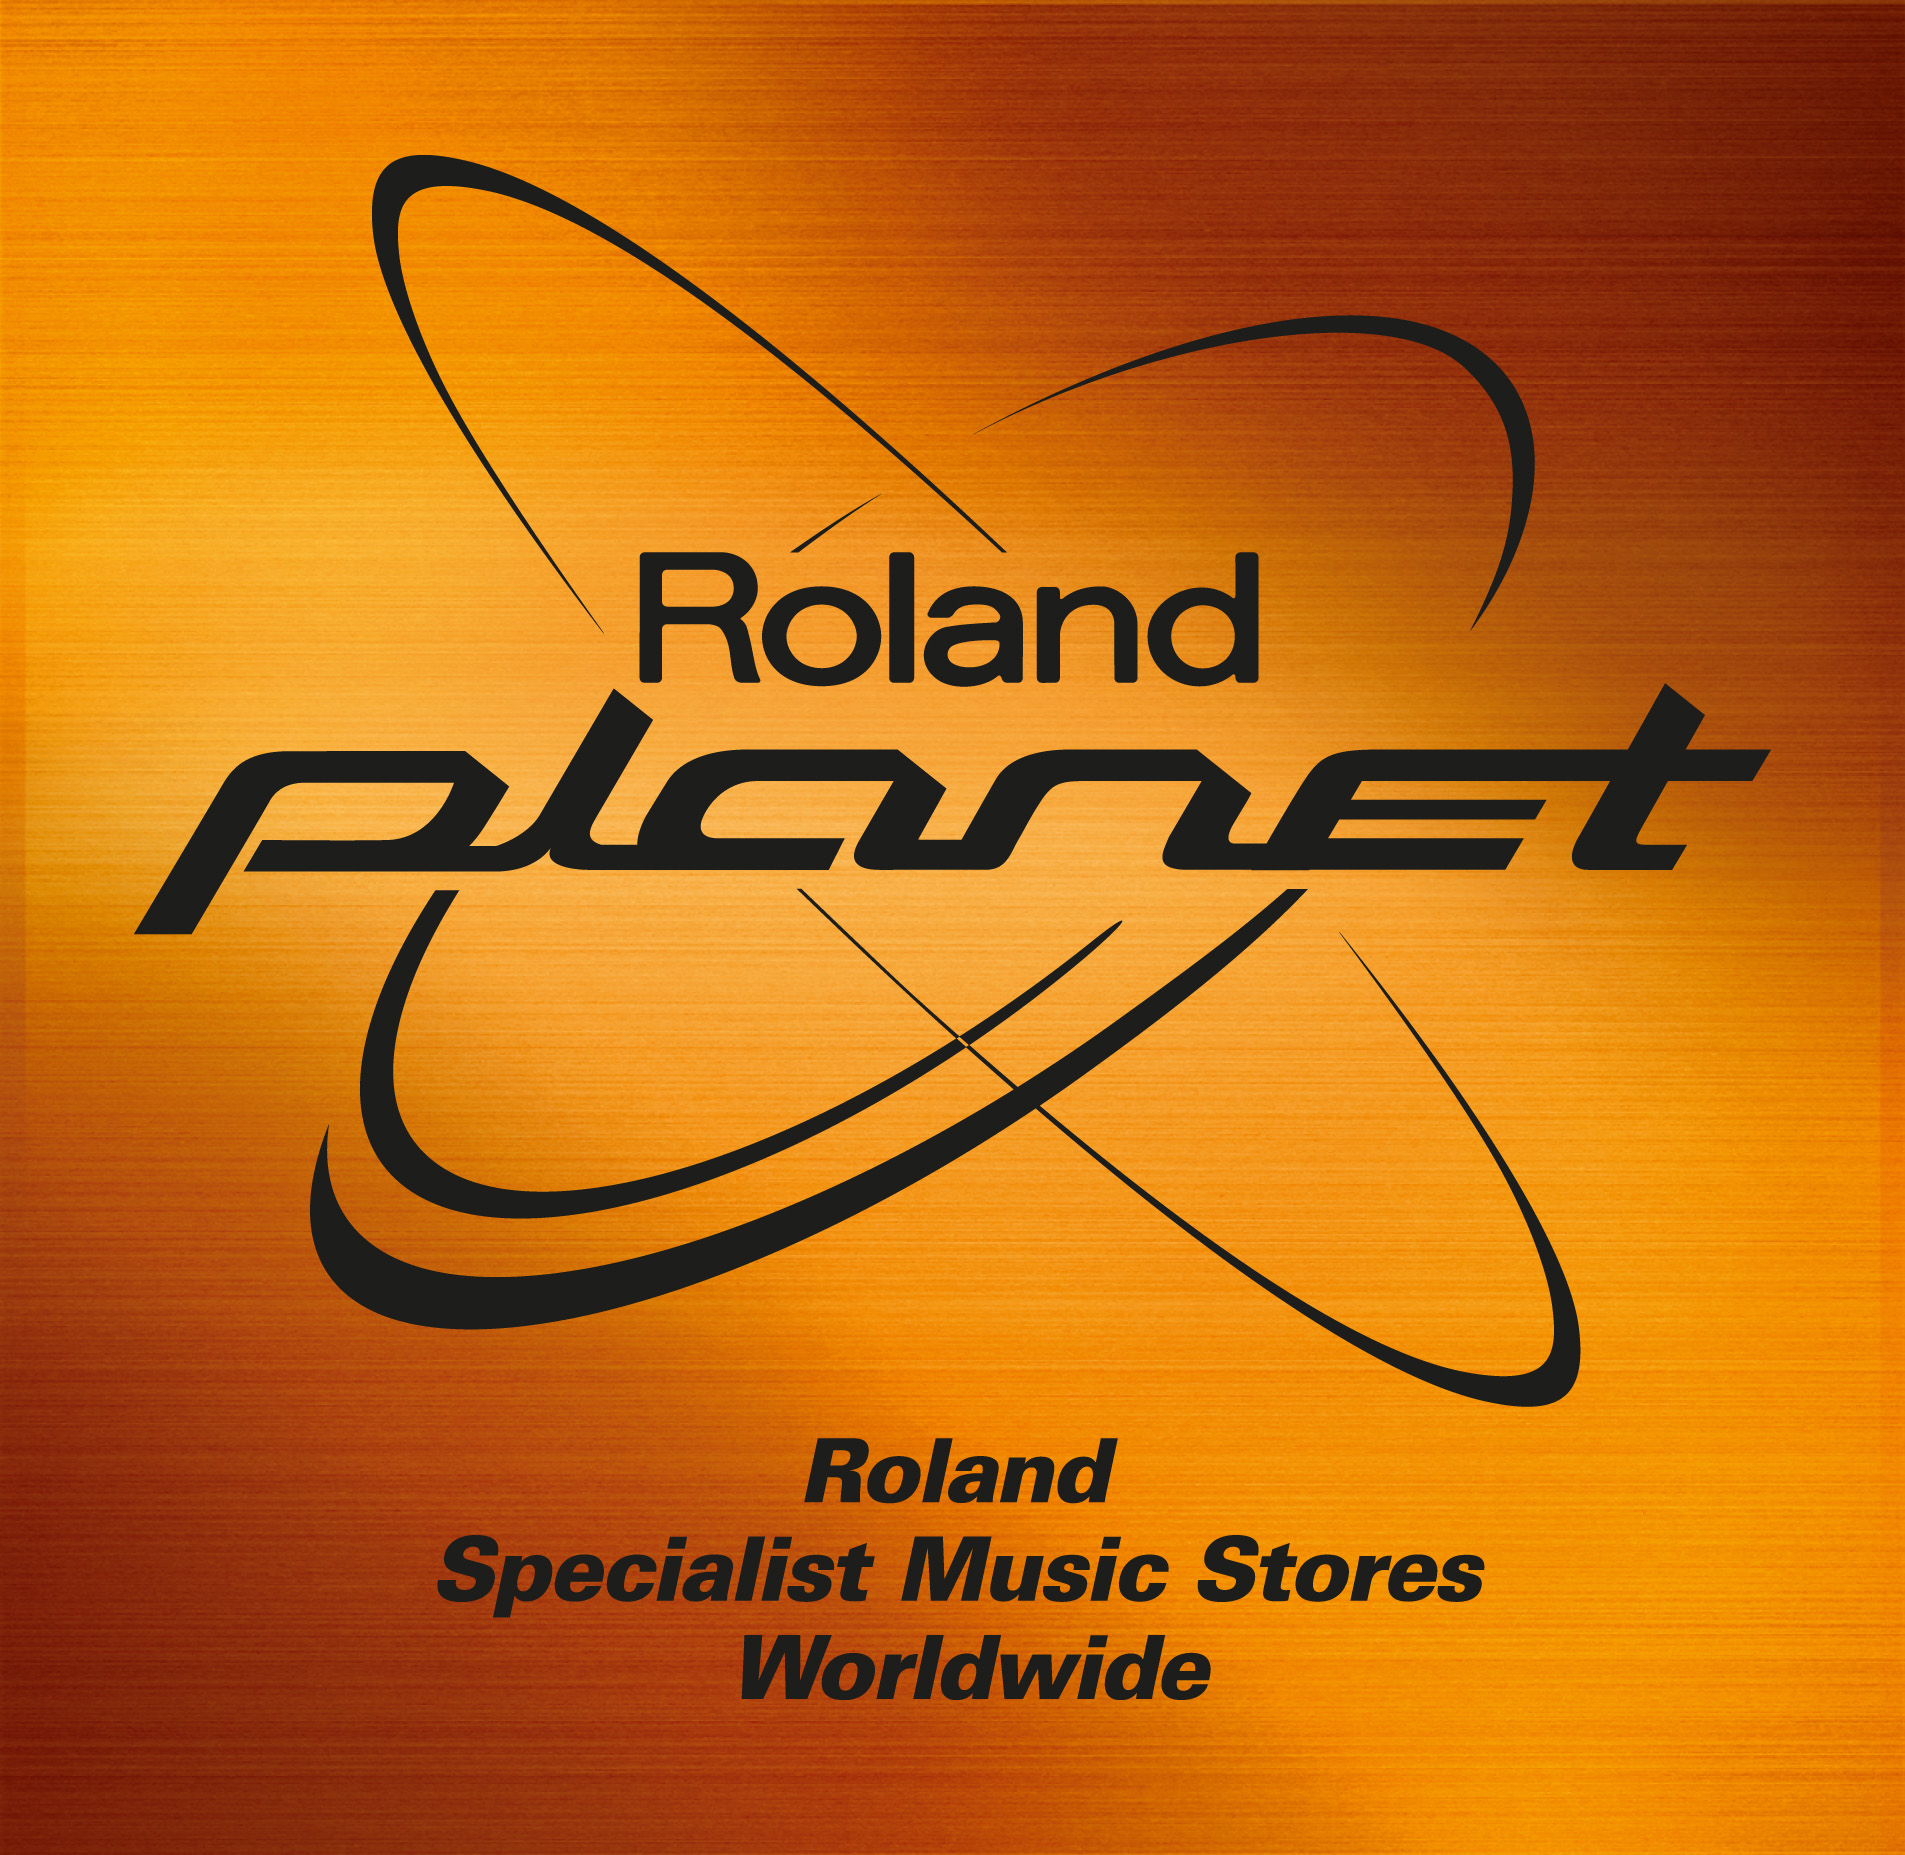 Roland Planet v ČR | Protext - distribution of press releases